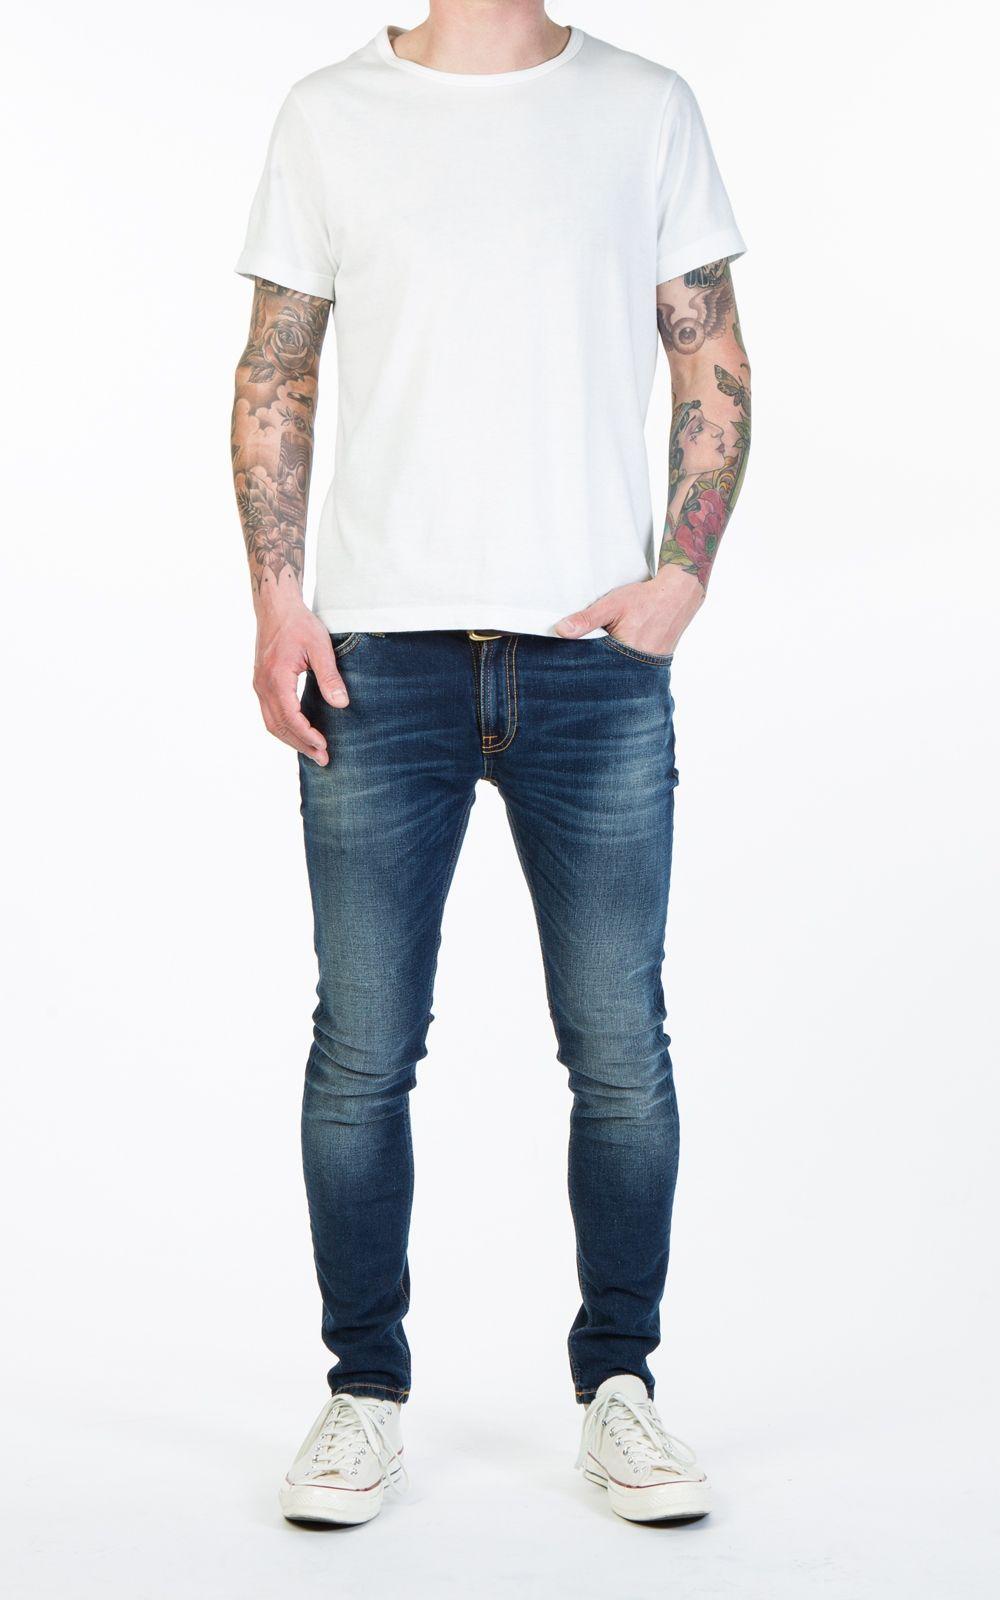 a76e1710565eda Nudie Jeans Skinny Lin Dark Double Indigo | Cultizm's New Arrivals 2017